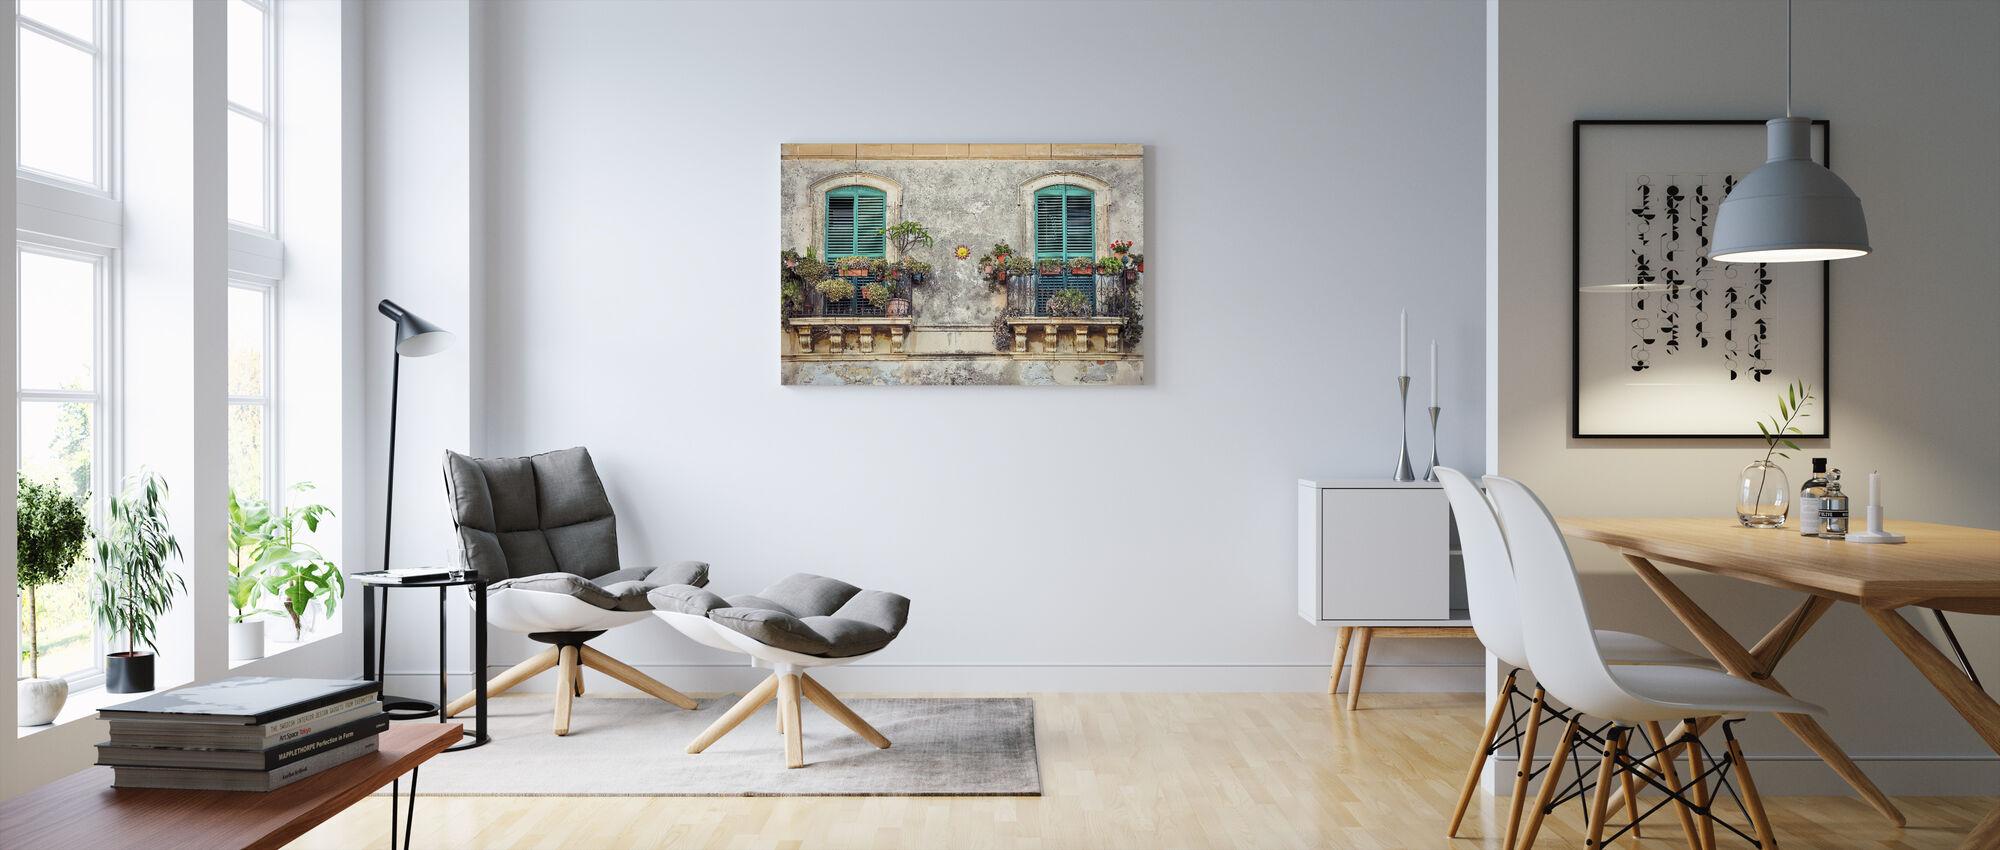 Balcony Windows - Canvas print - Living Room